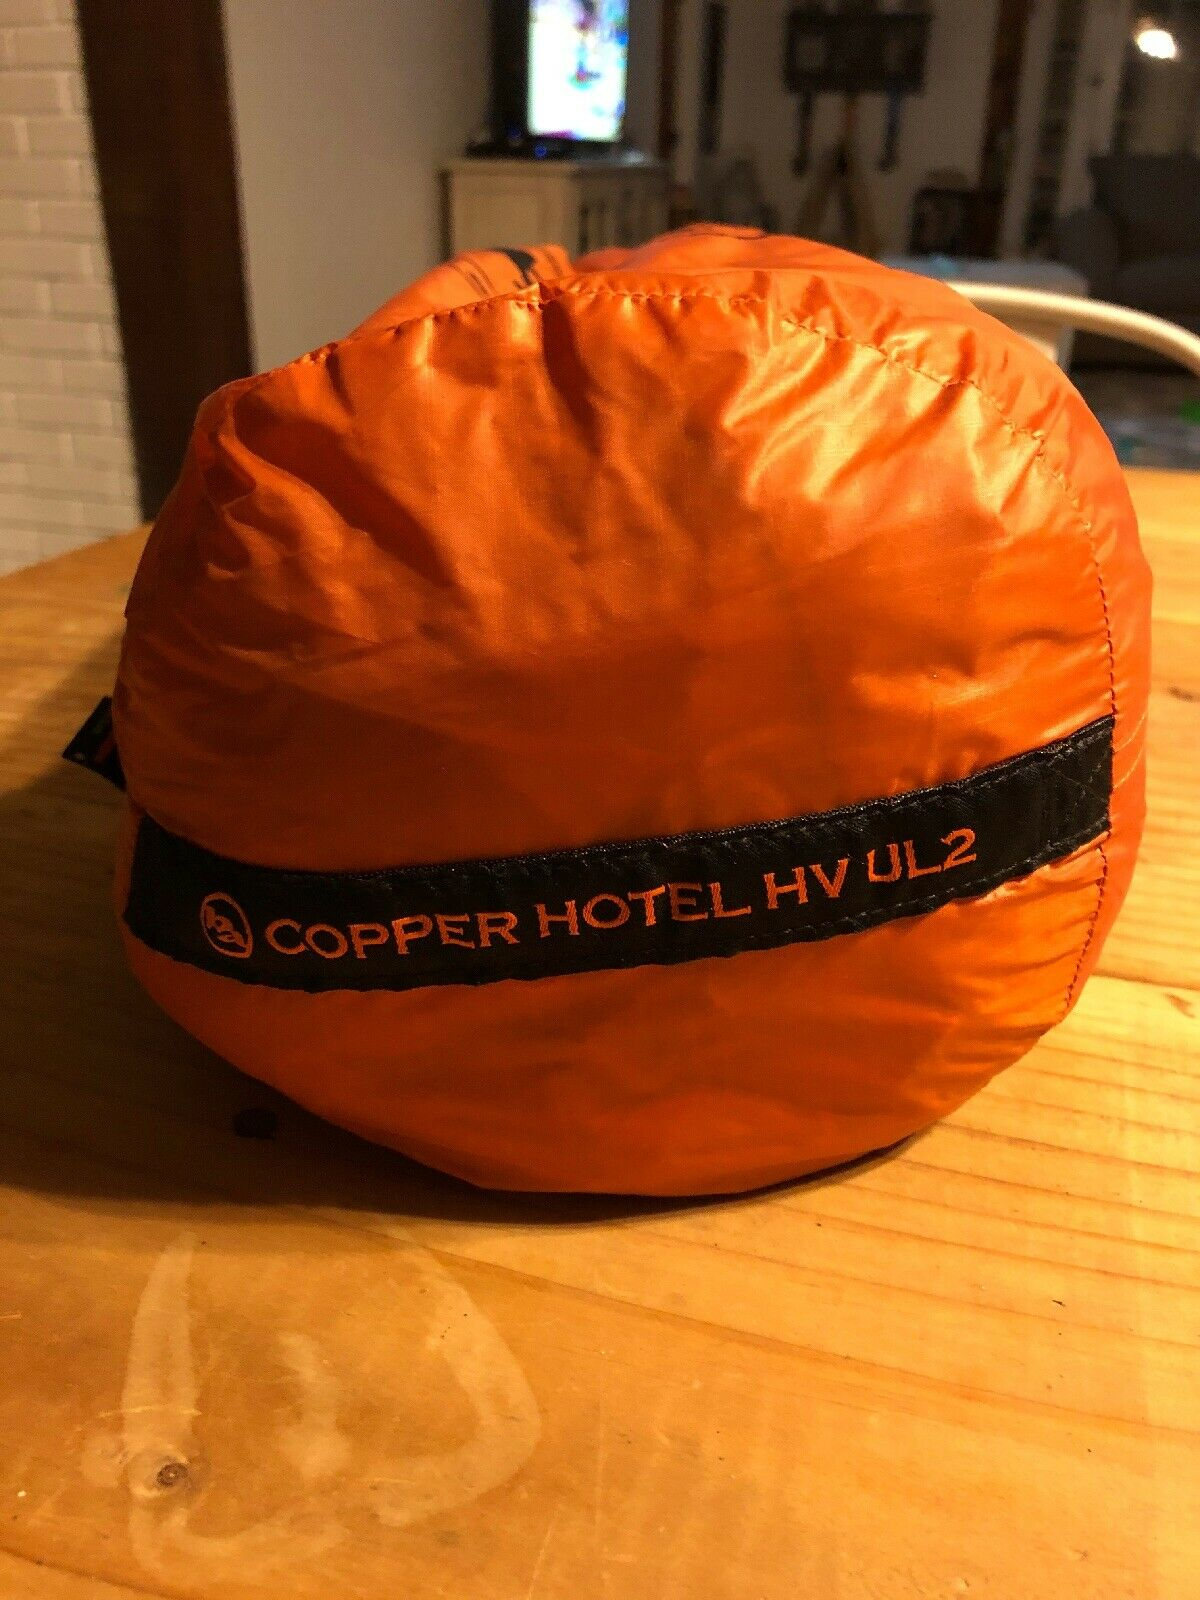 Big Agnes Copper Hotel HV UL2 Tent